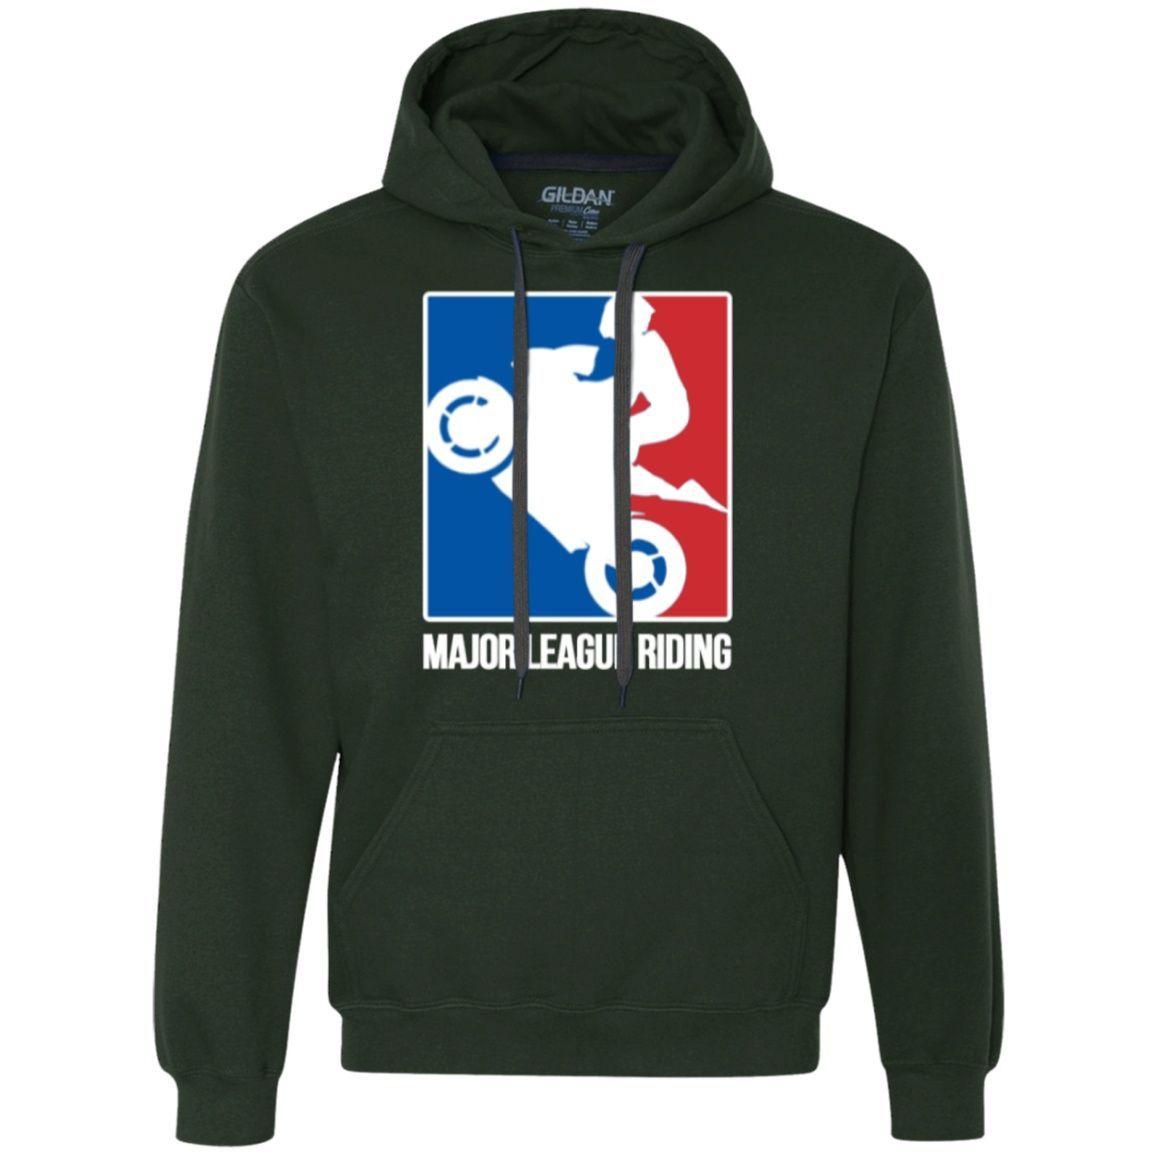 Major League Riding Hoodie